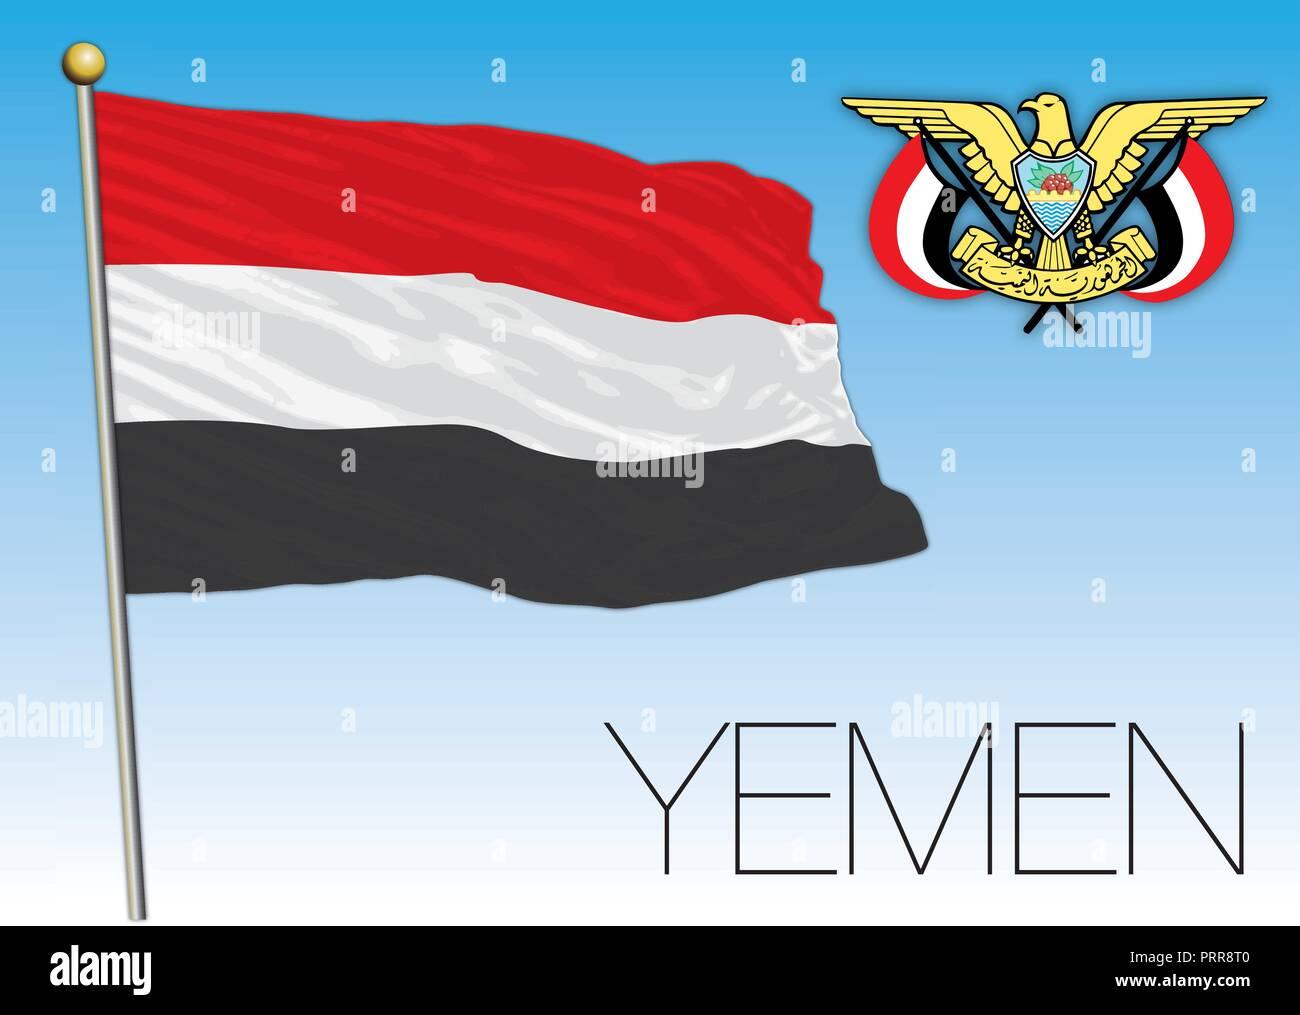 Yemen official flag, vector illustration Stock Vector